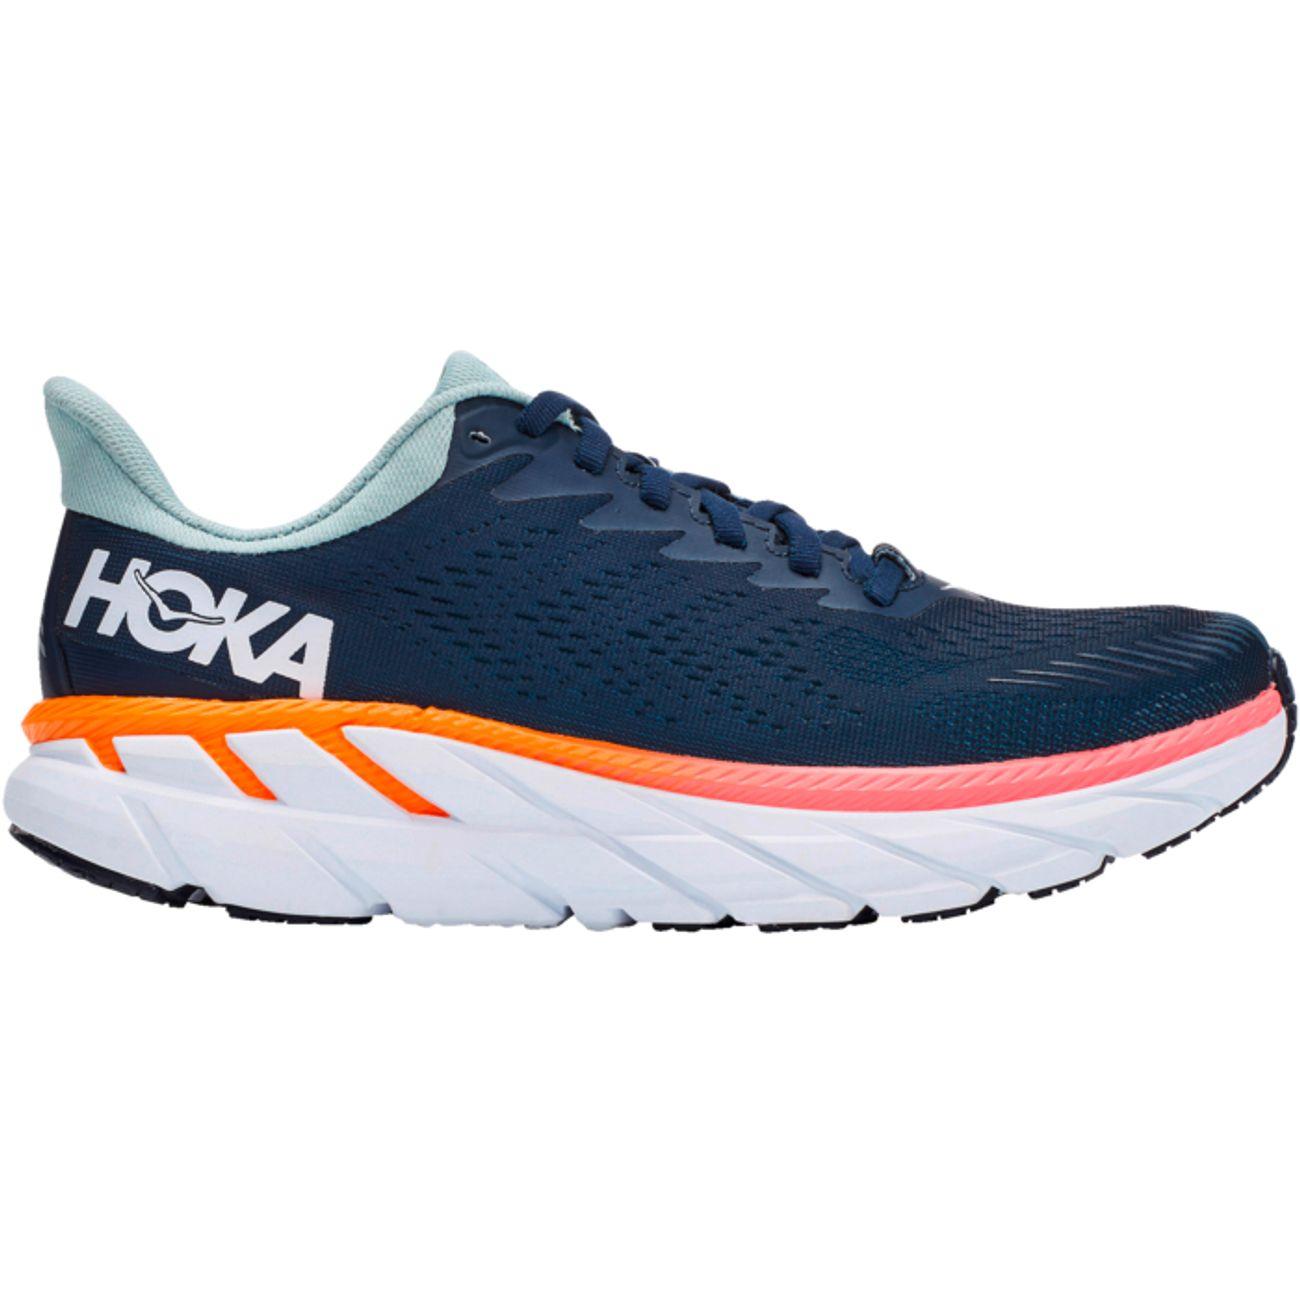 Chaussures de running Route pour femme Hoka One Clifton 7 - Tailles; 38 au 41 1/3